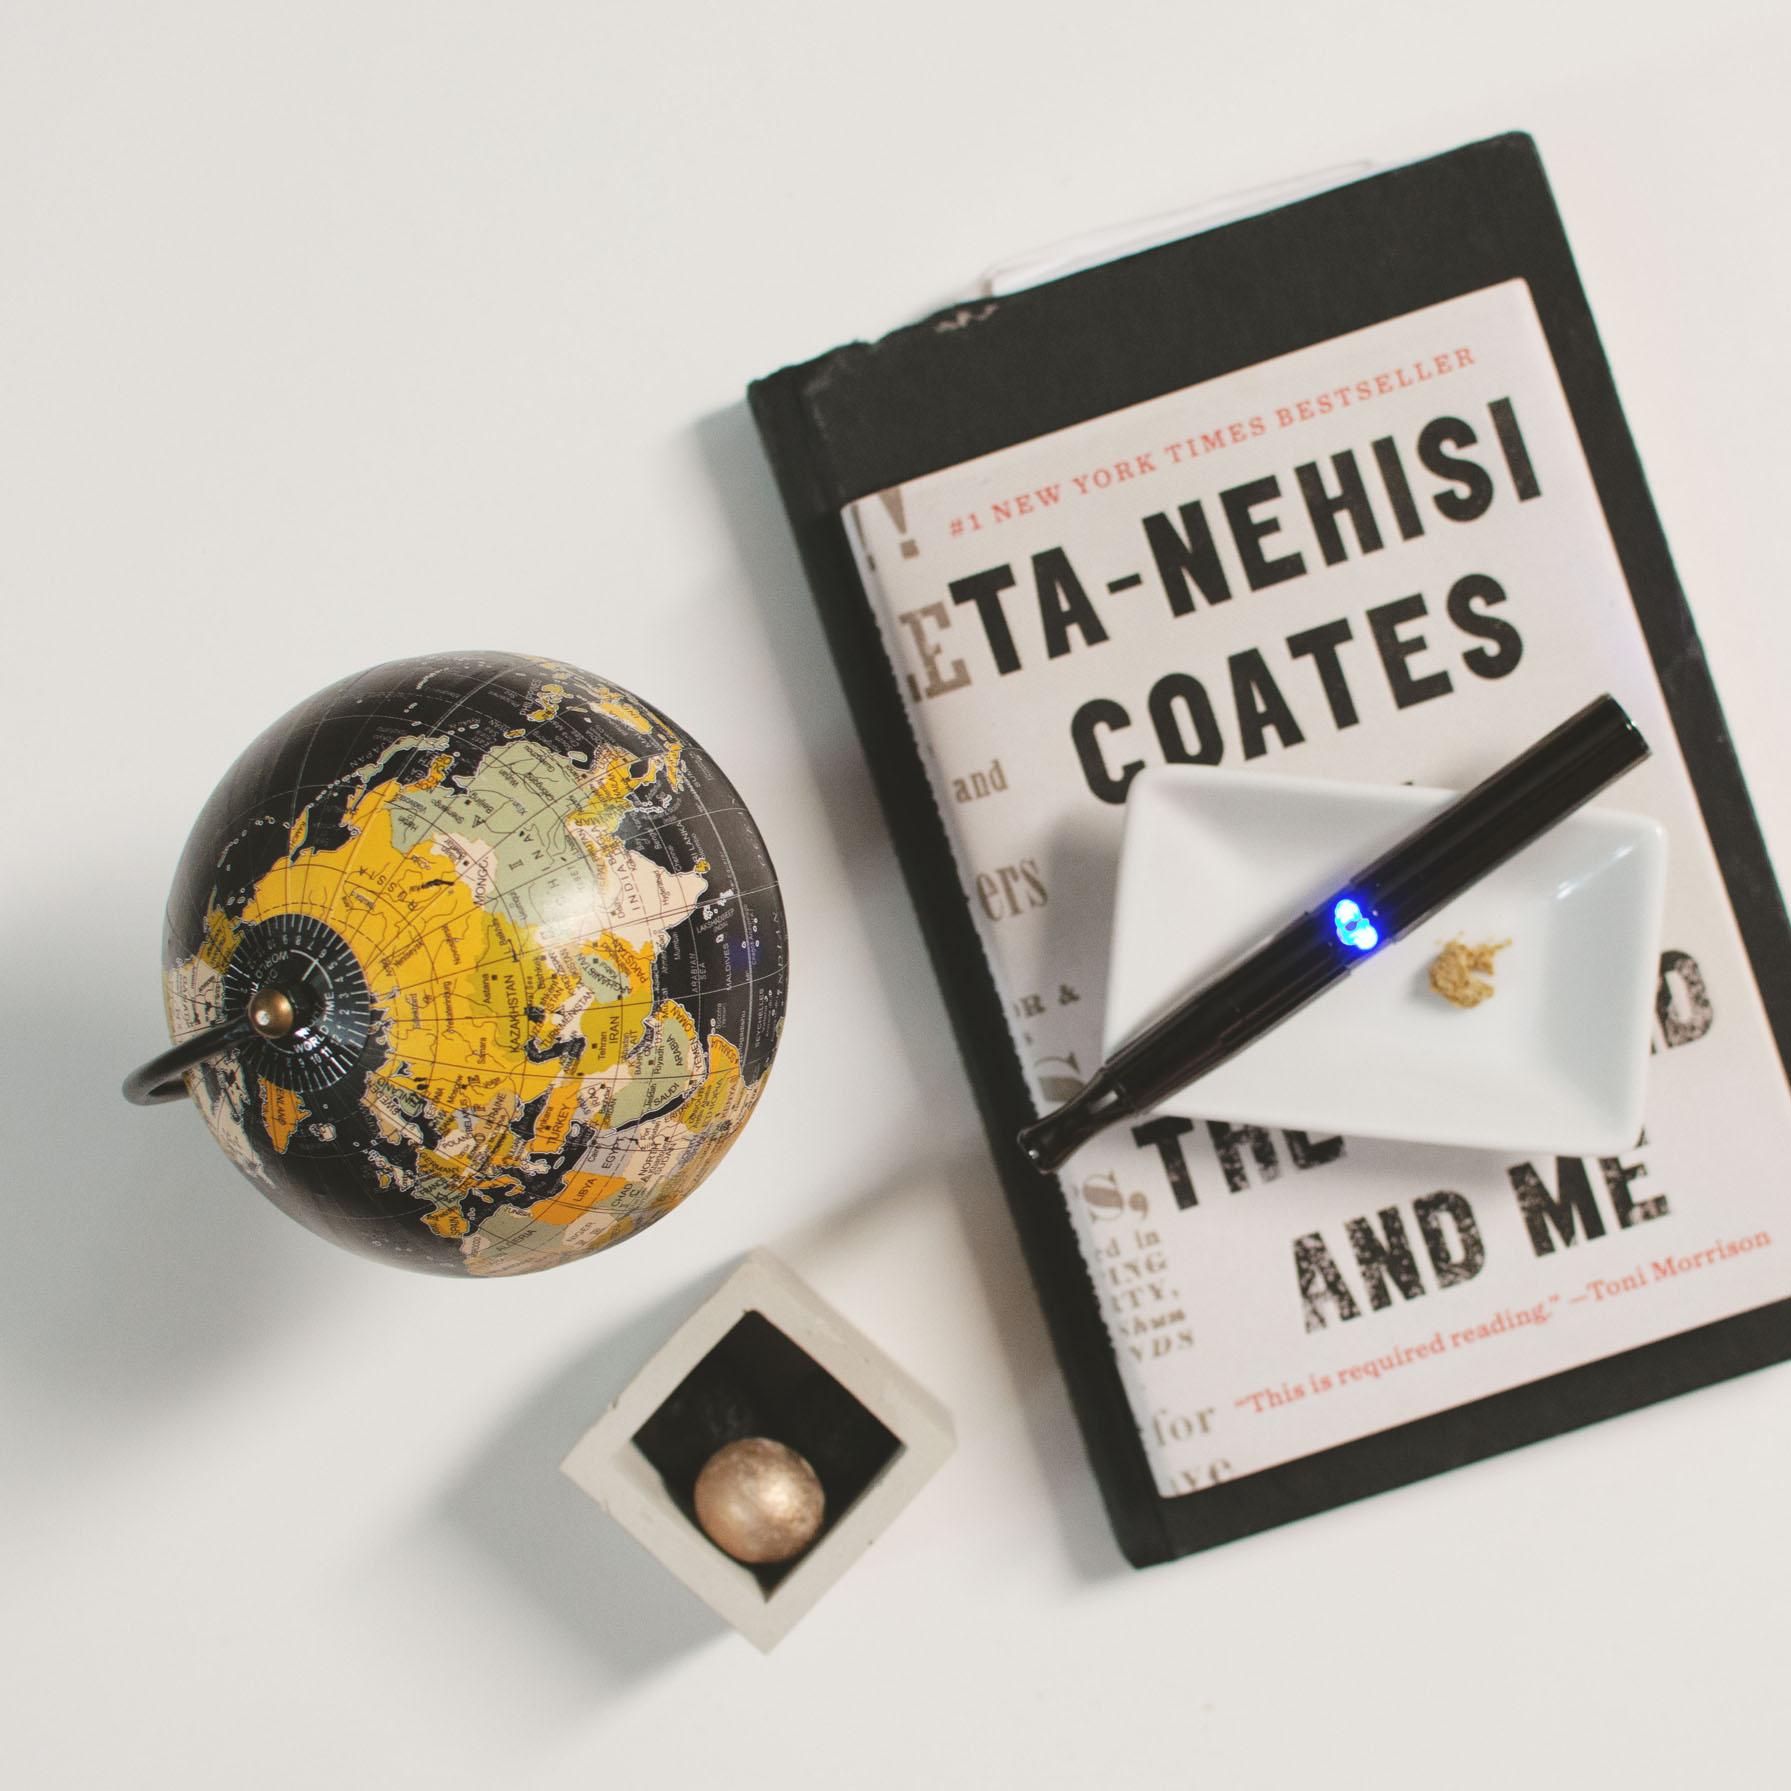 puffco-globe-book.jpg